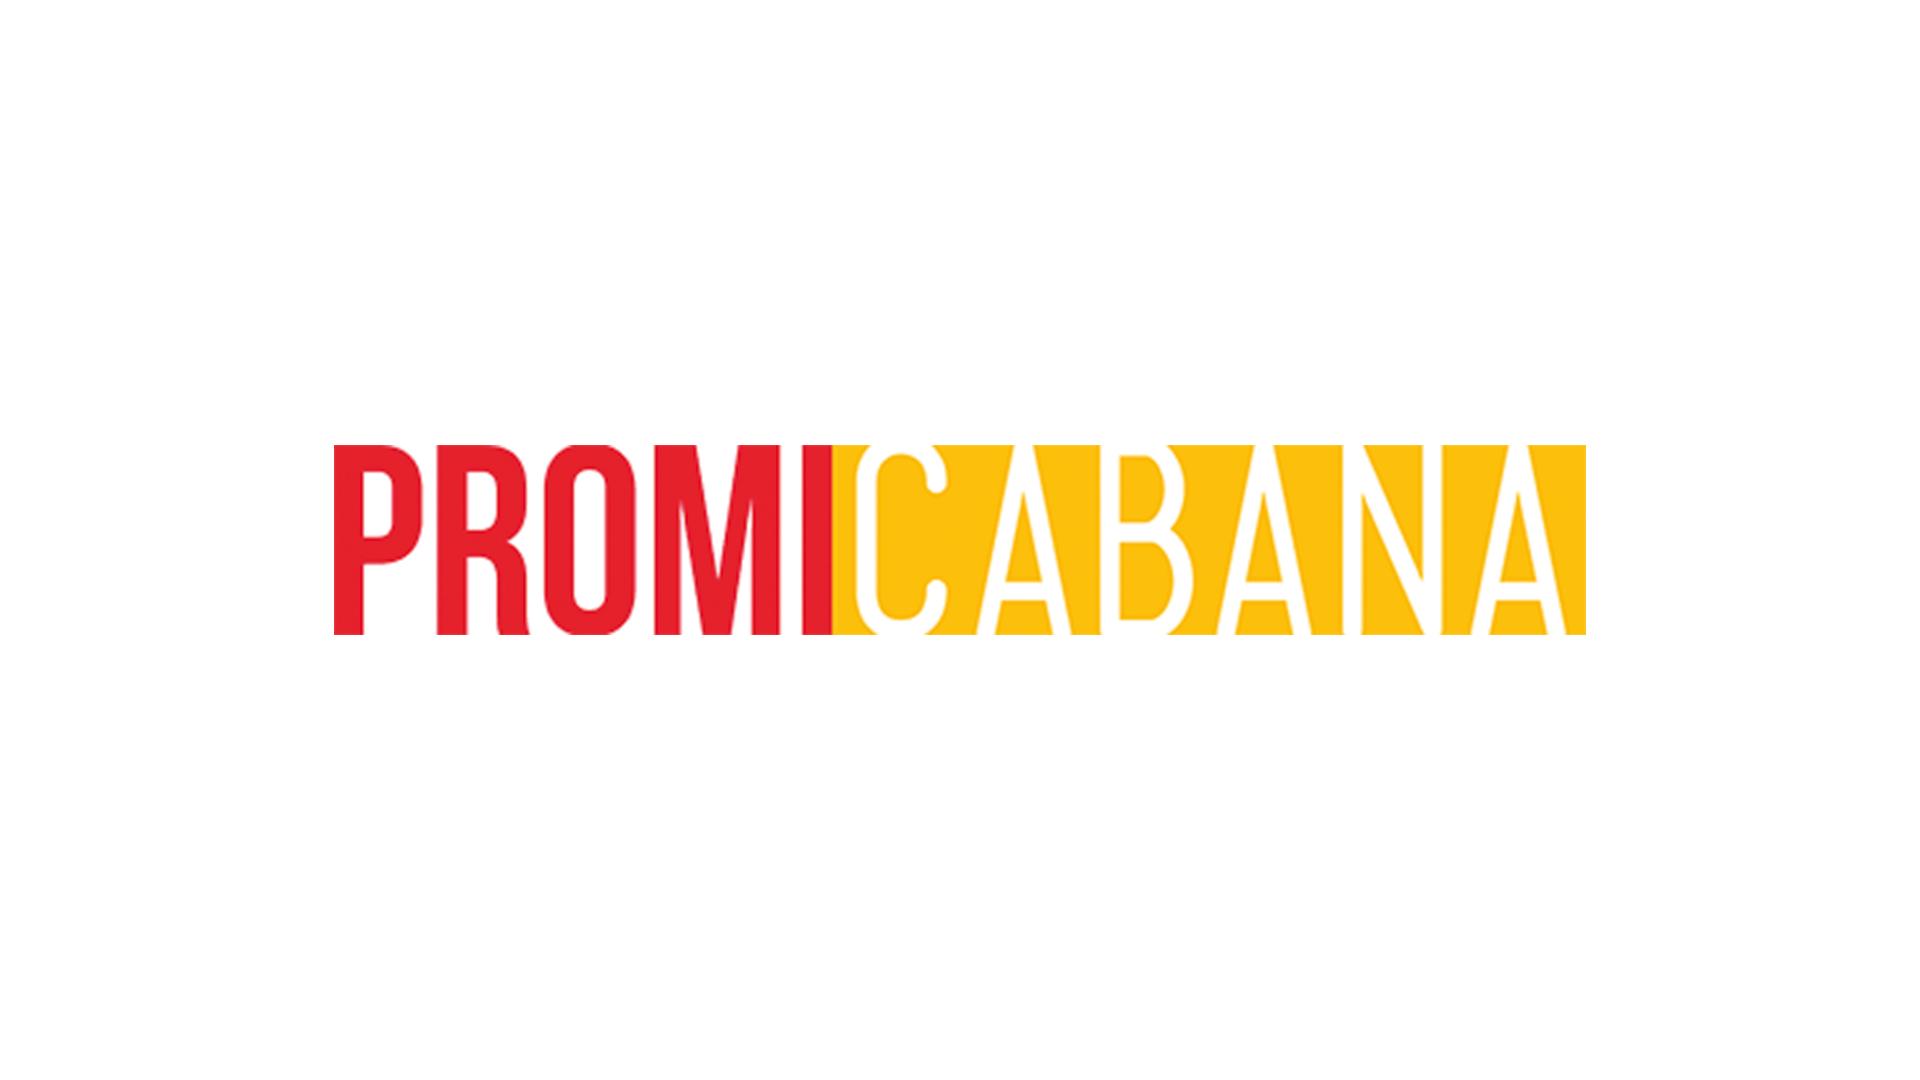 Woody-Harrelson-Matthew-McConaughey-True-Detective-Trailer